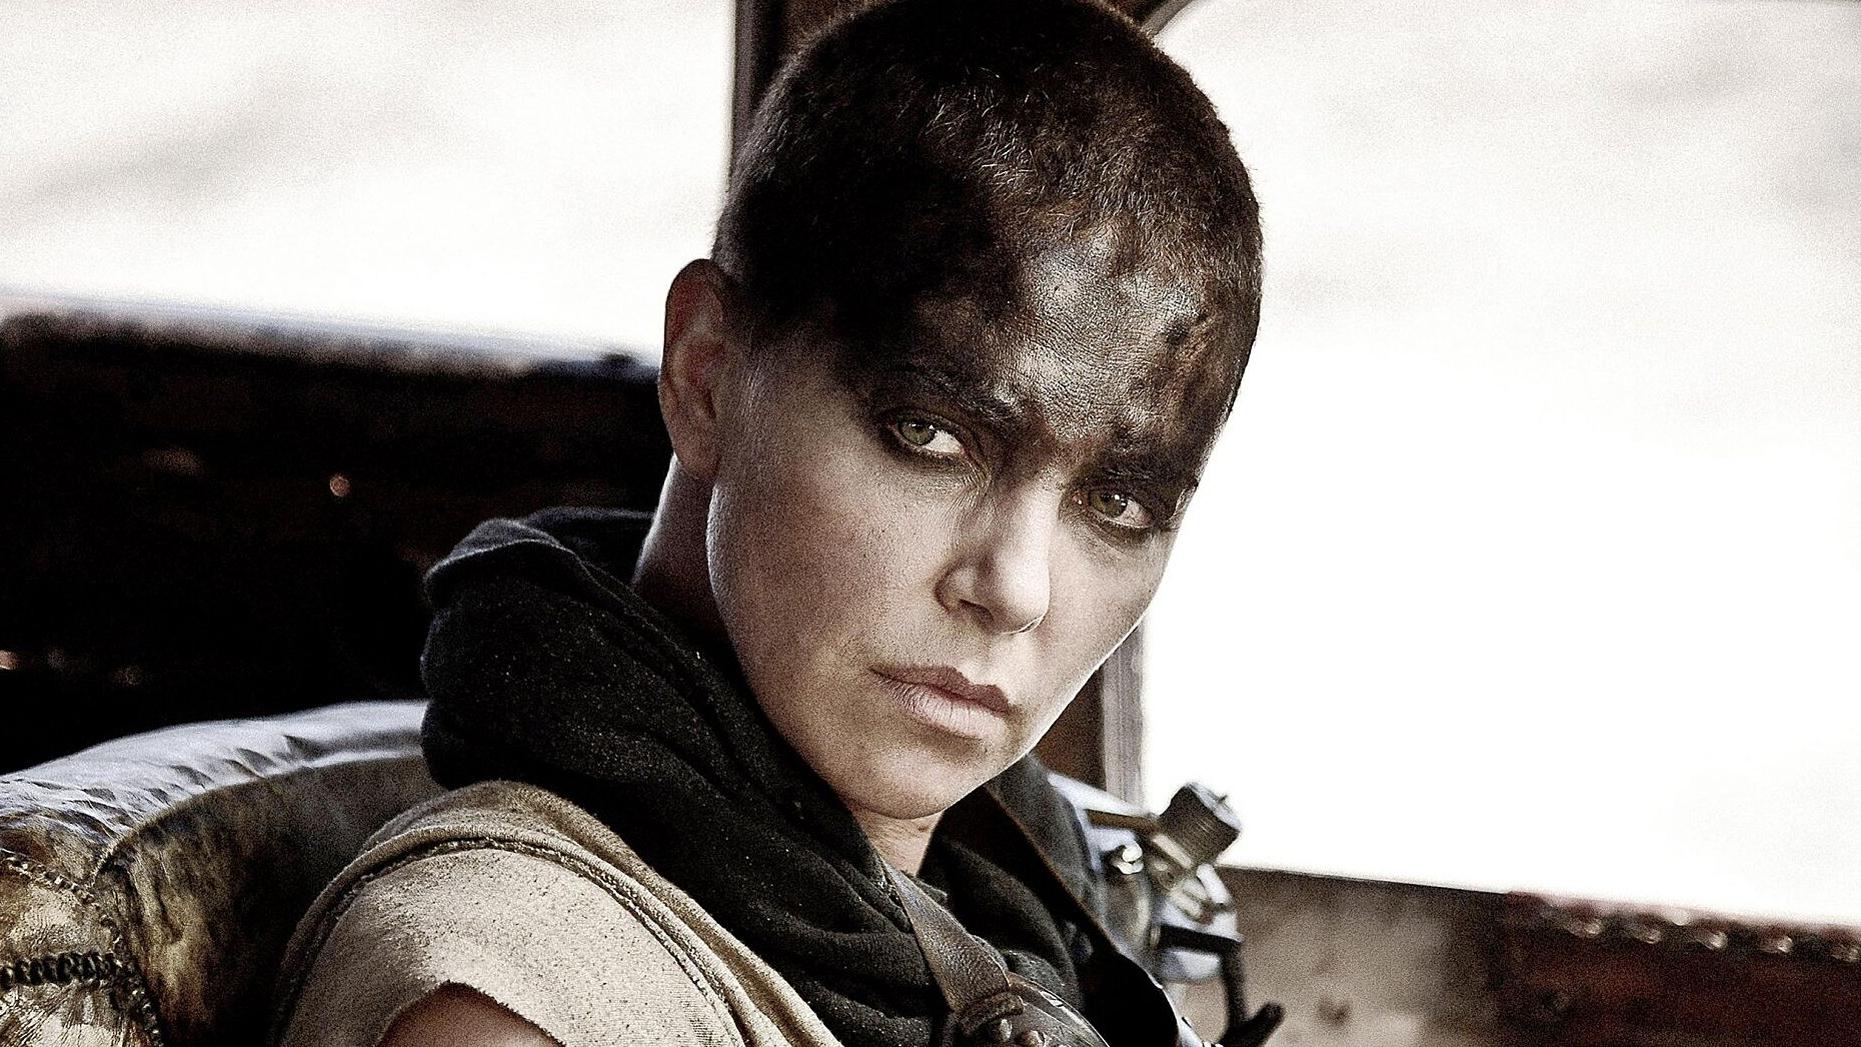 Mad Max: Furiosa Release Date Revealed